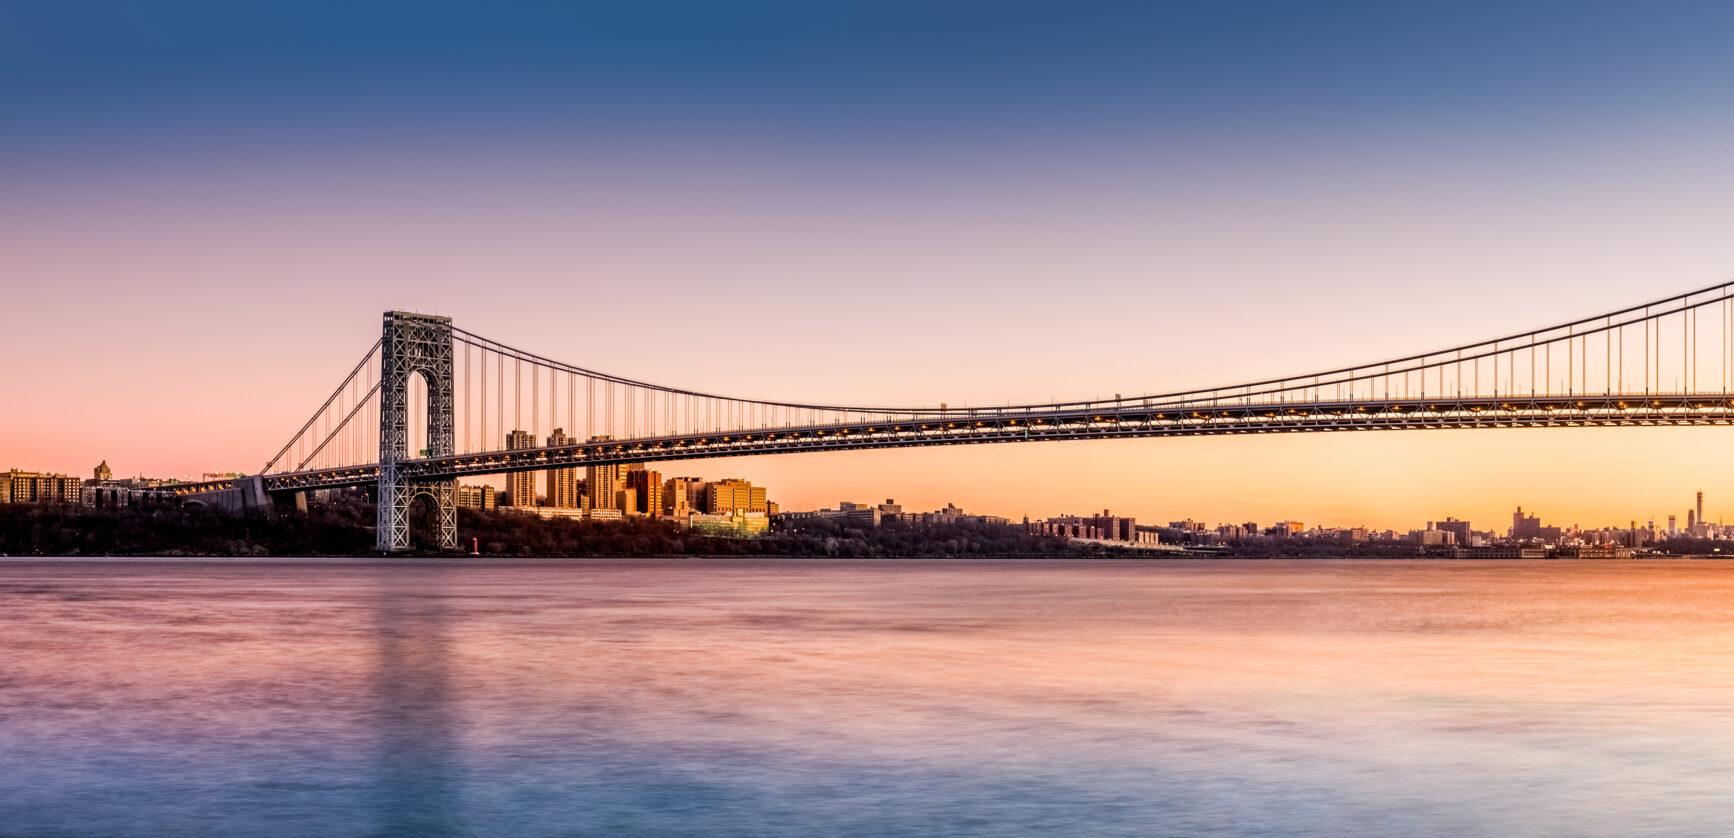 a bridge in sunset